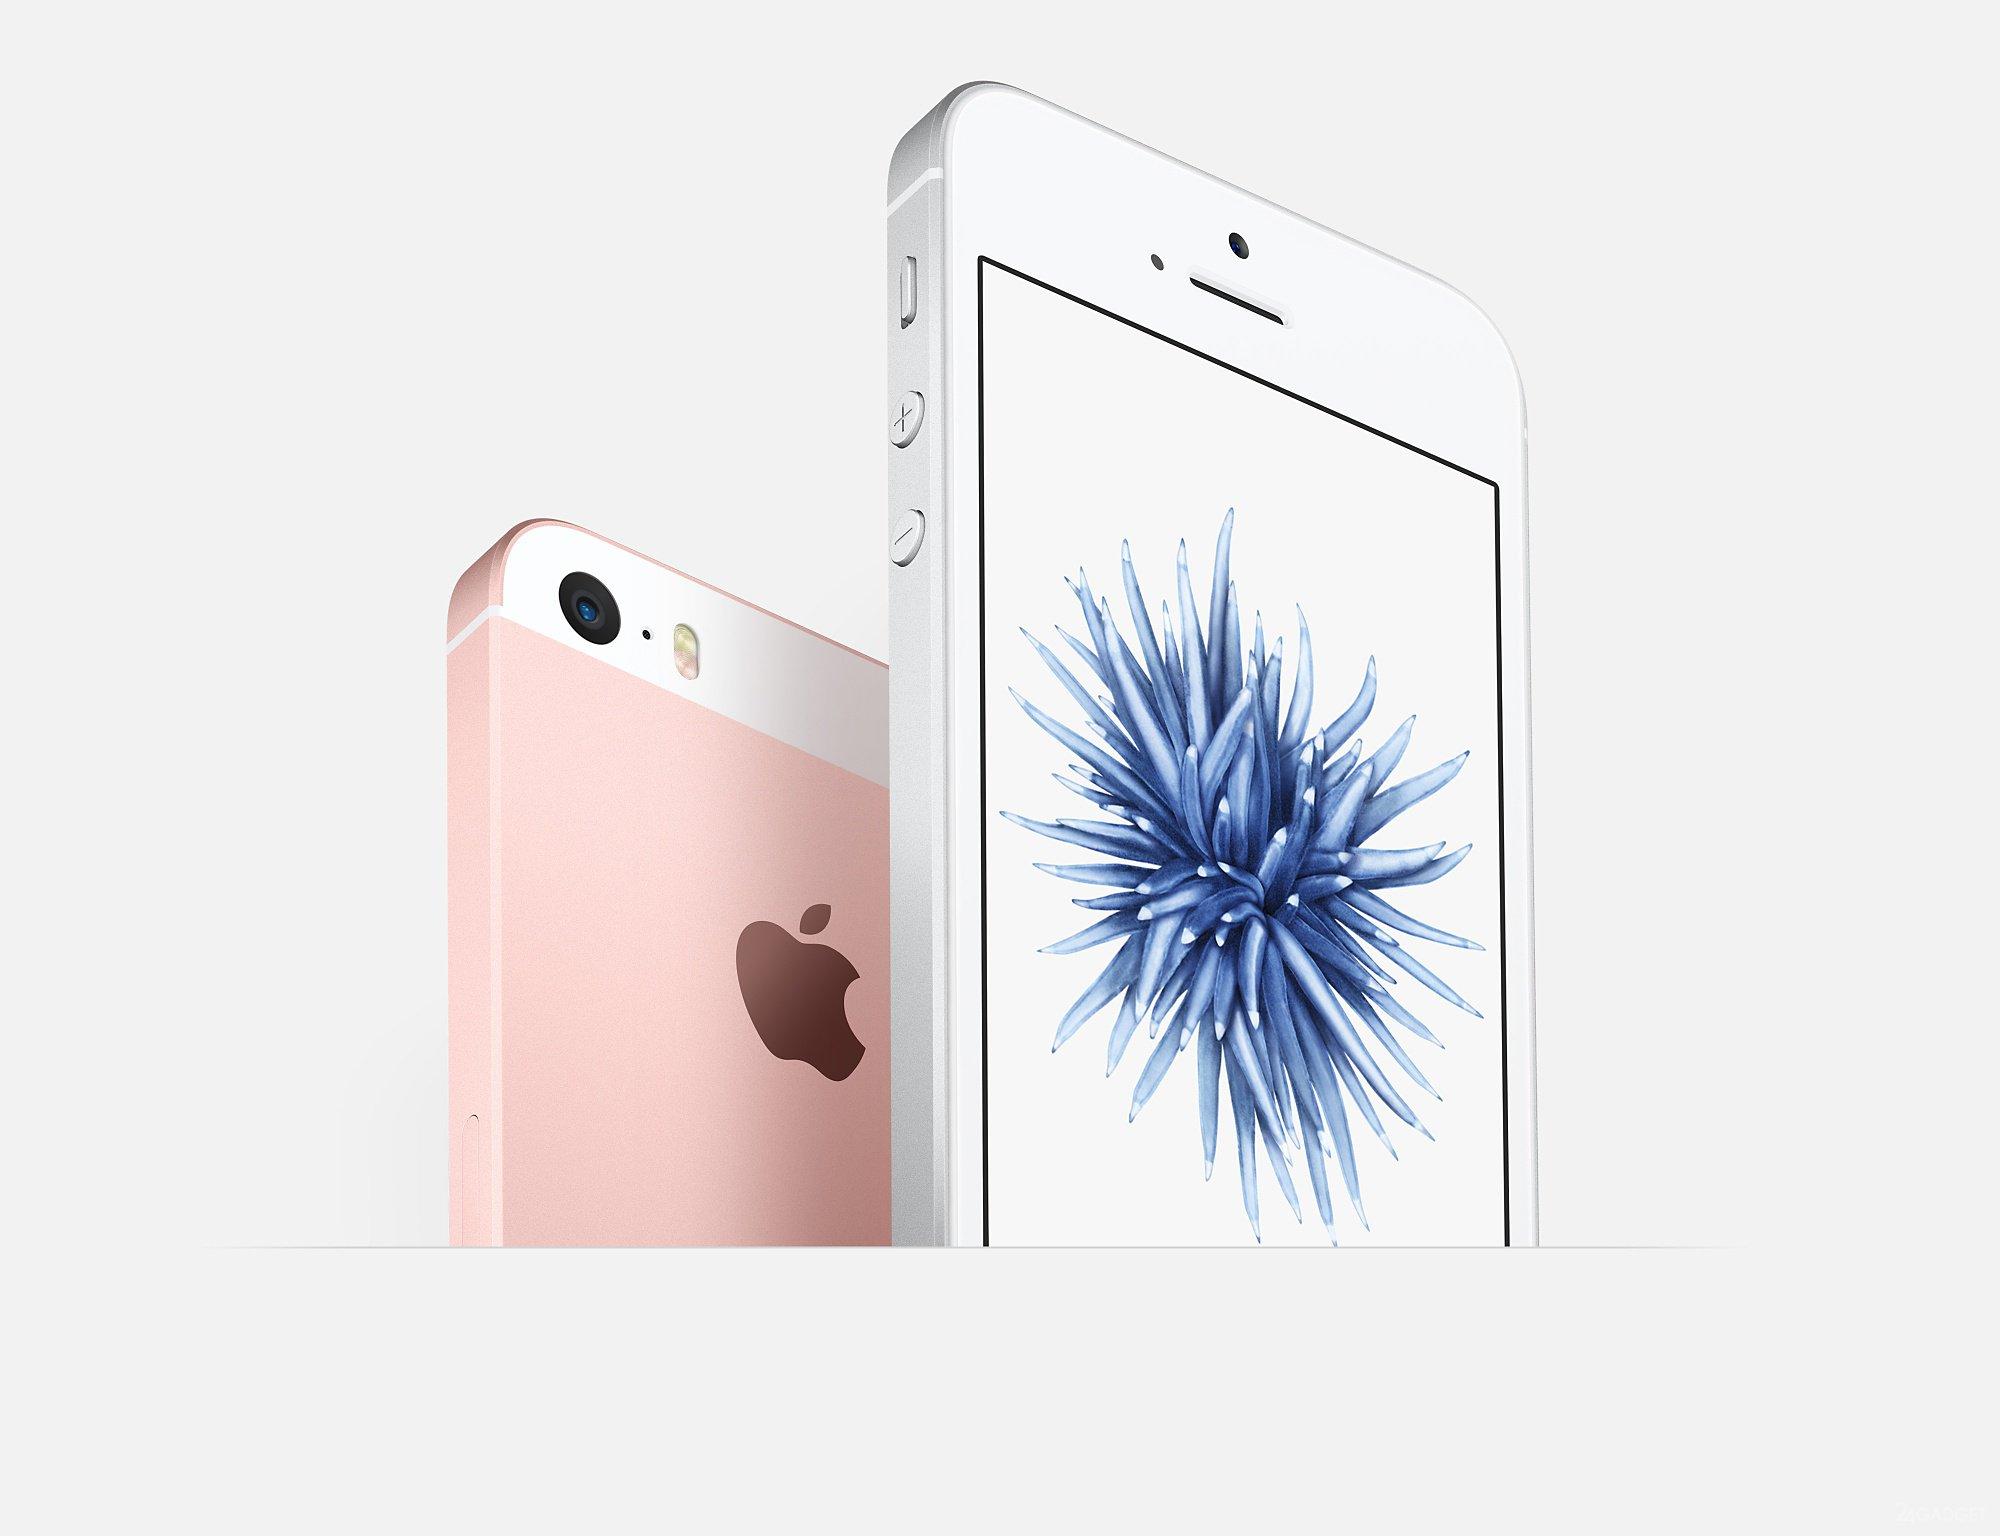 Apple iPhone SE 64 GB, unlocked M: Apple iPhone IPhone SE, vs iPhone